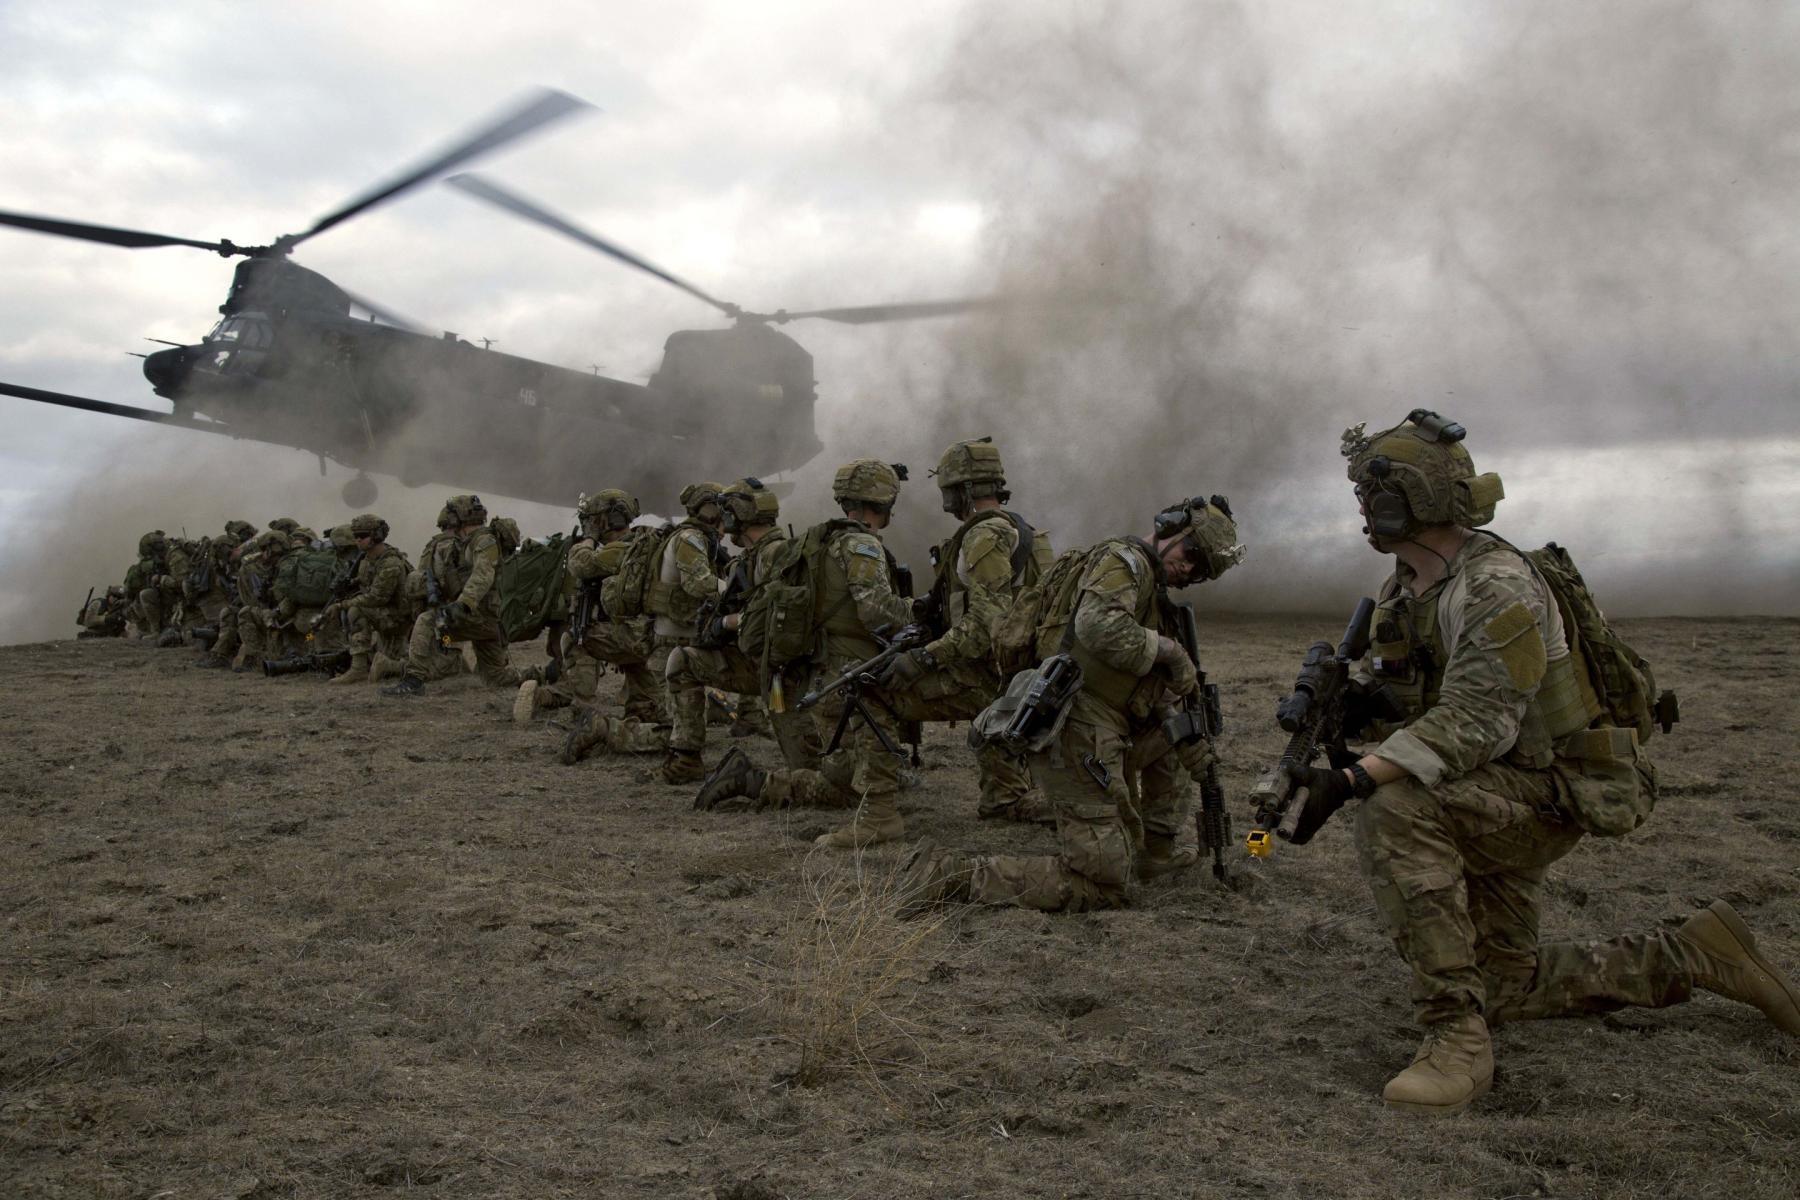 75th Ranger Regiment (United States)